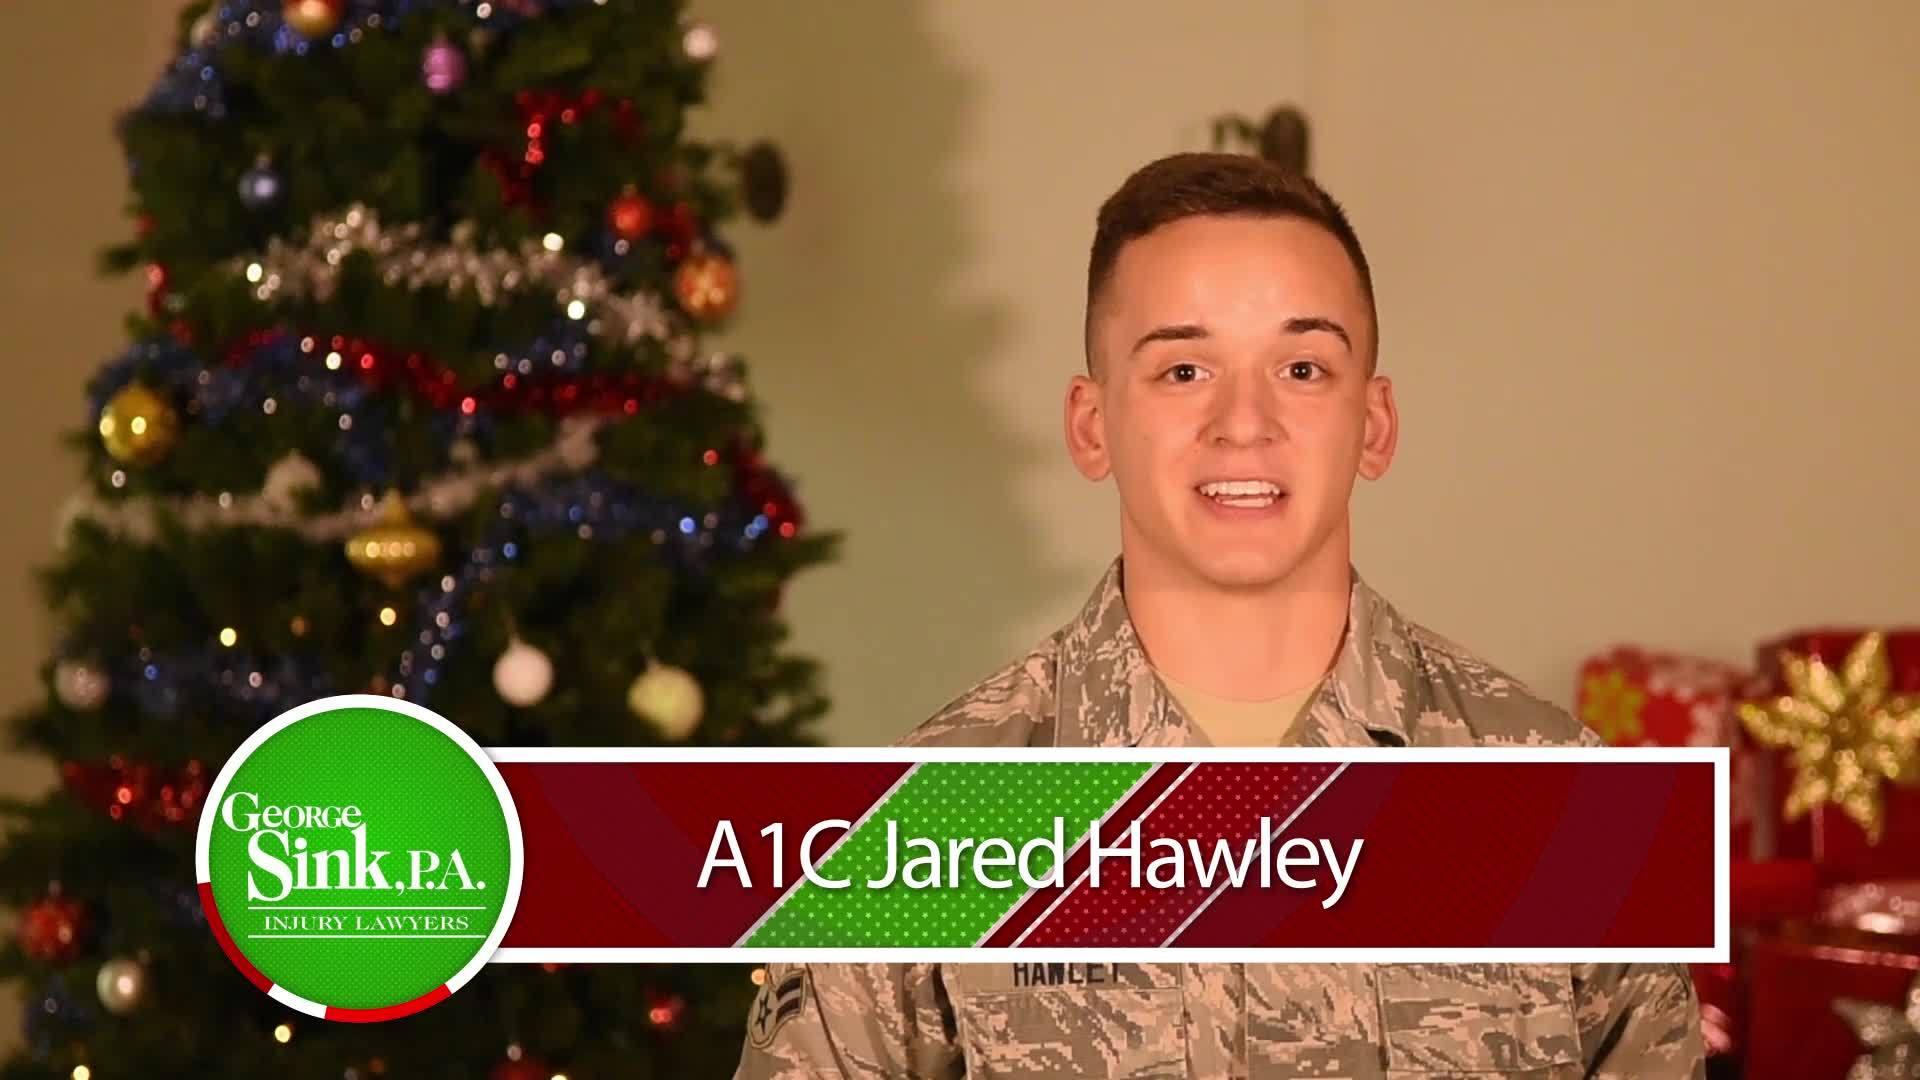 A1C Jared Hawley